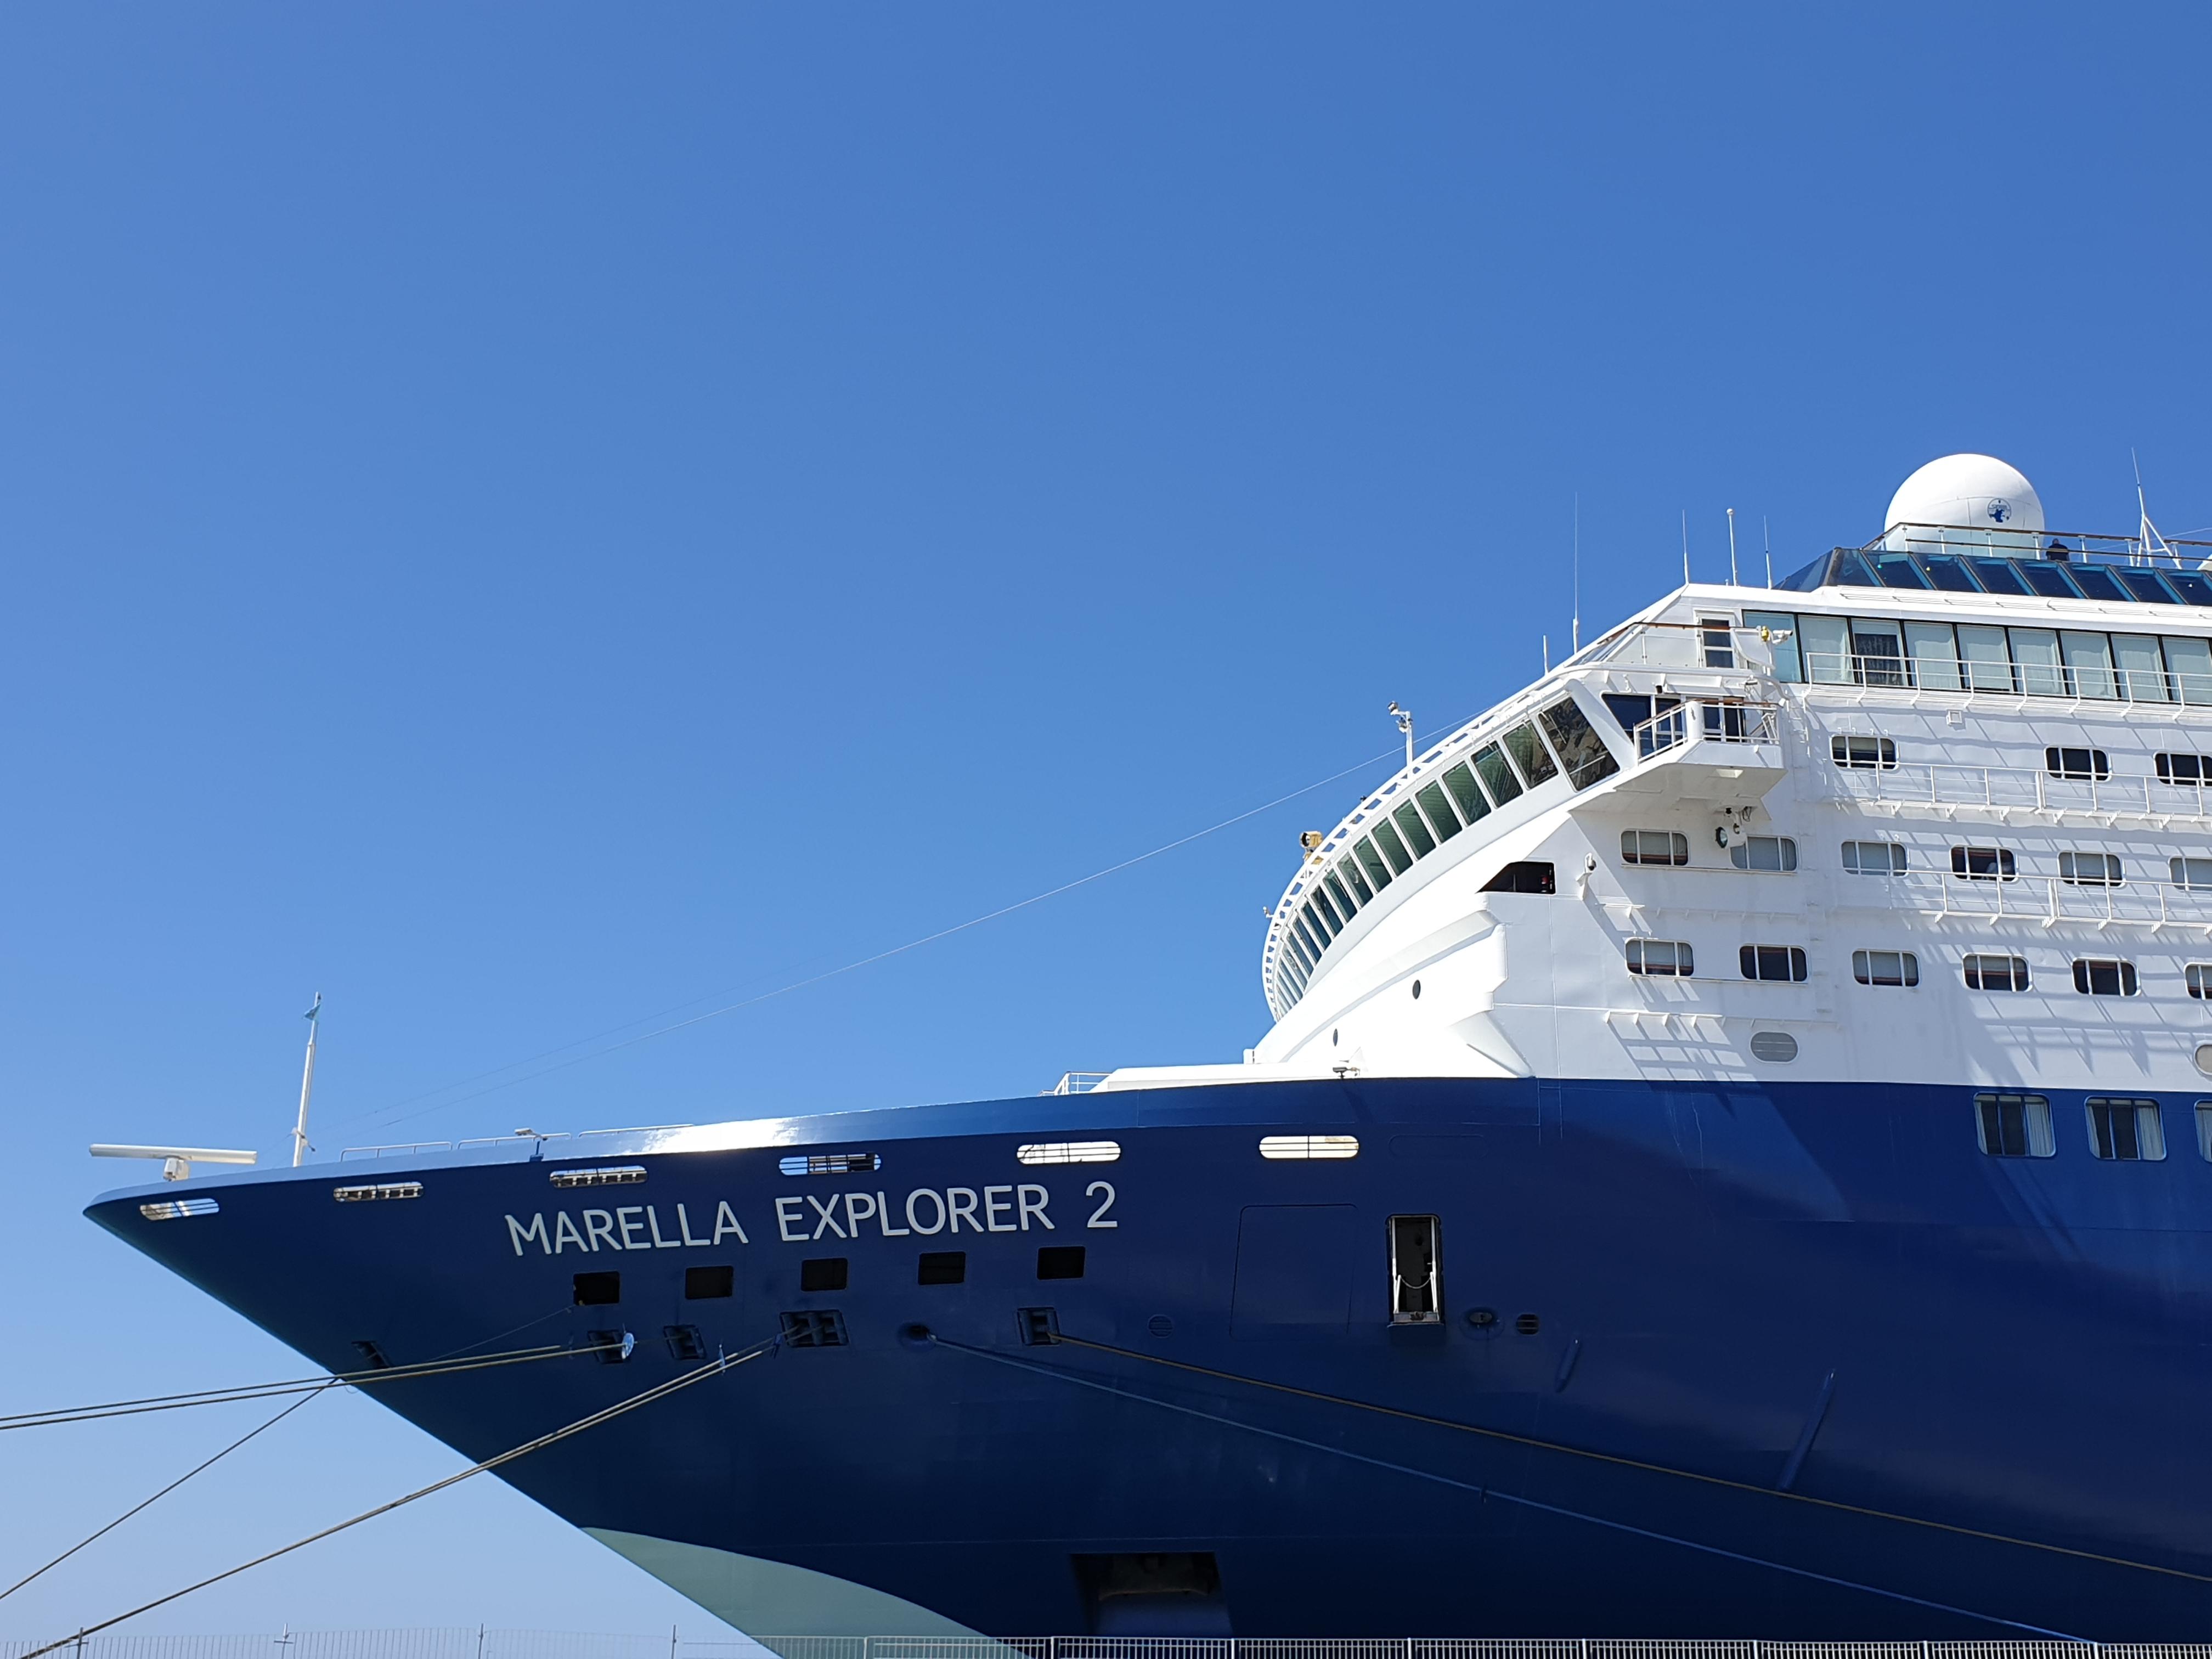 Découvrir Marella Explorer 2